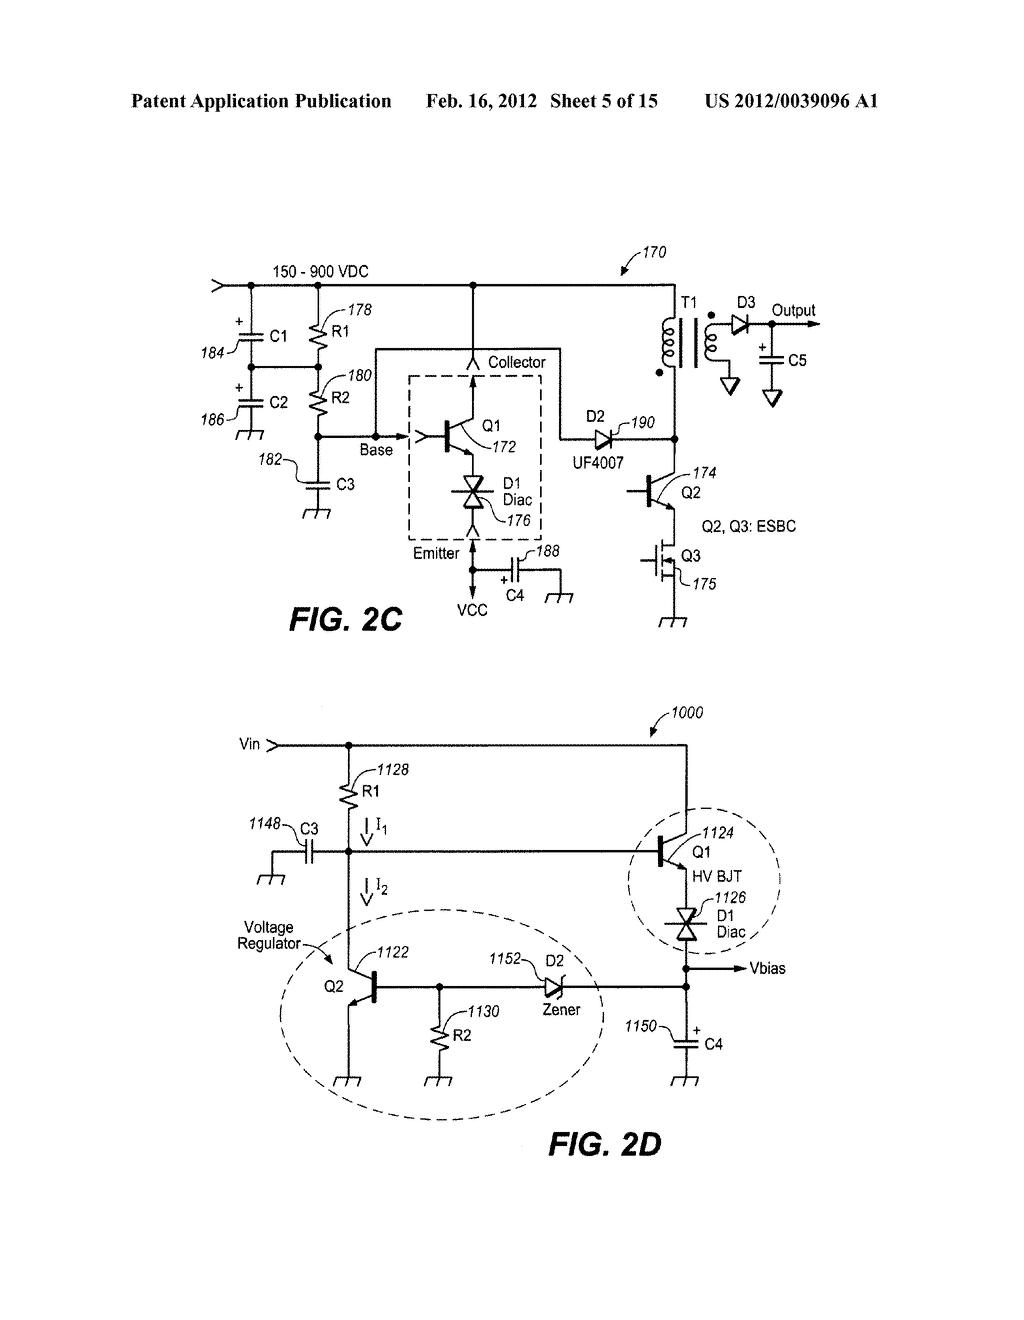 High Voltage Circuit Diagram Regulatoric Powersupplycircuit Seekiccom Startup Schematic And Image 06